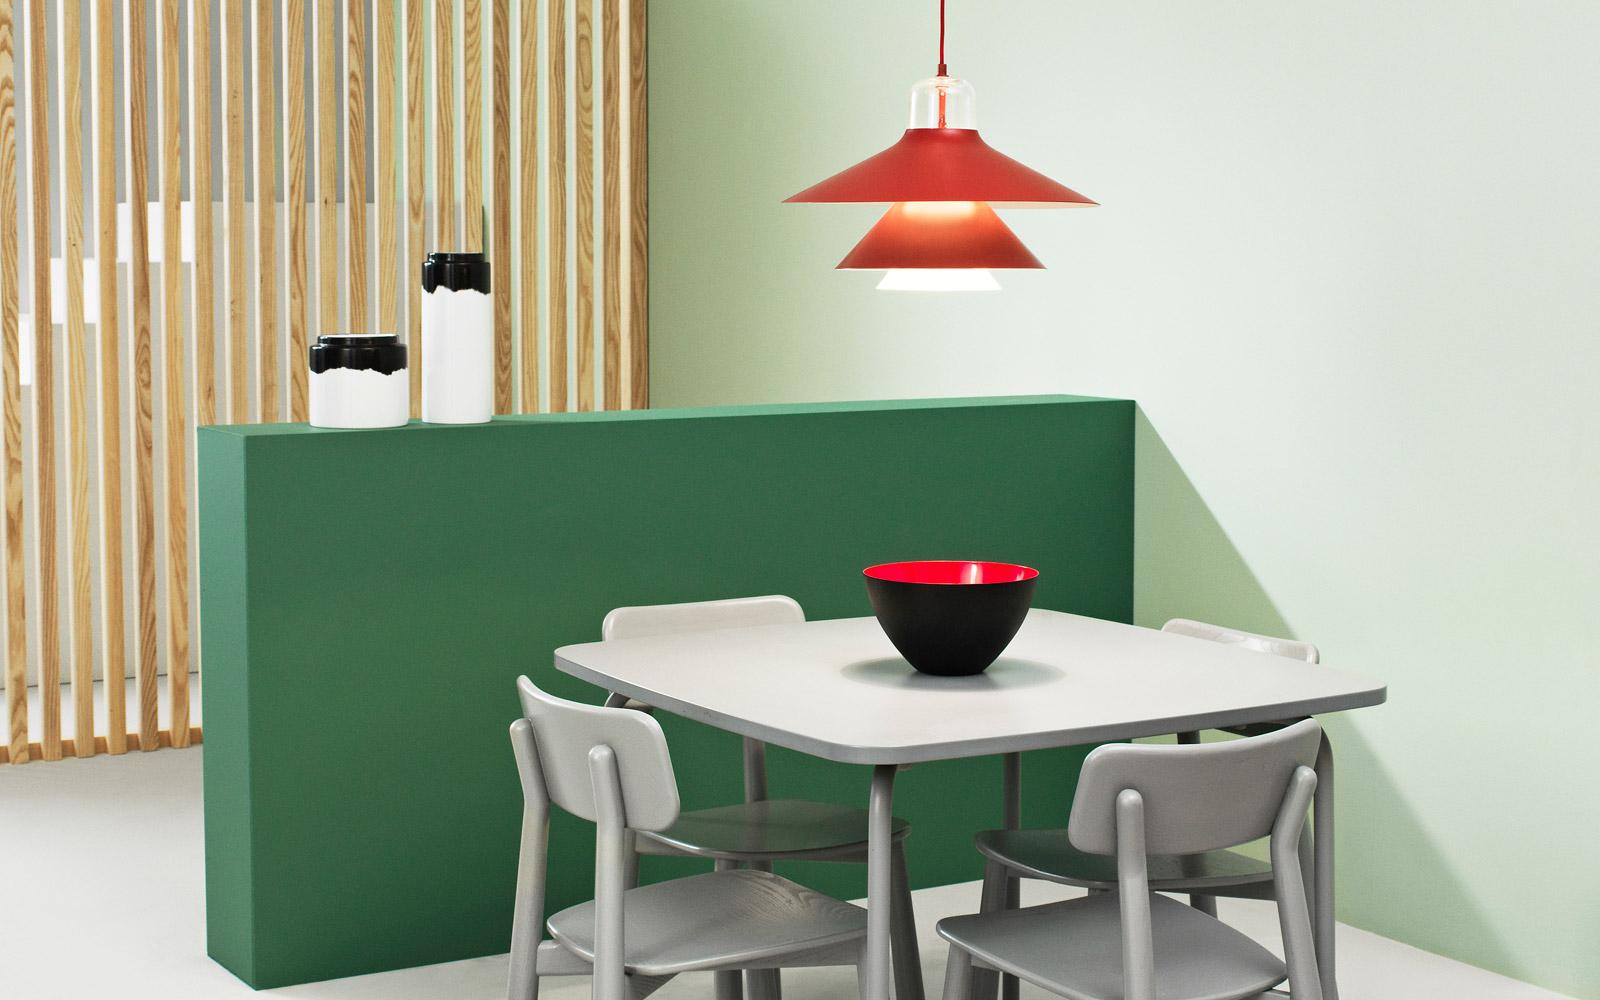 Vases-design-Agnes-Fries-Normann Copenhagen-08